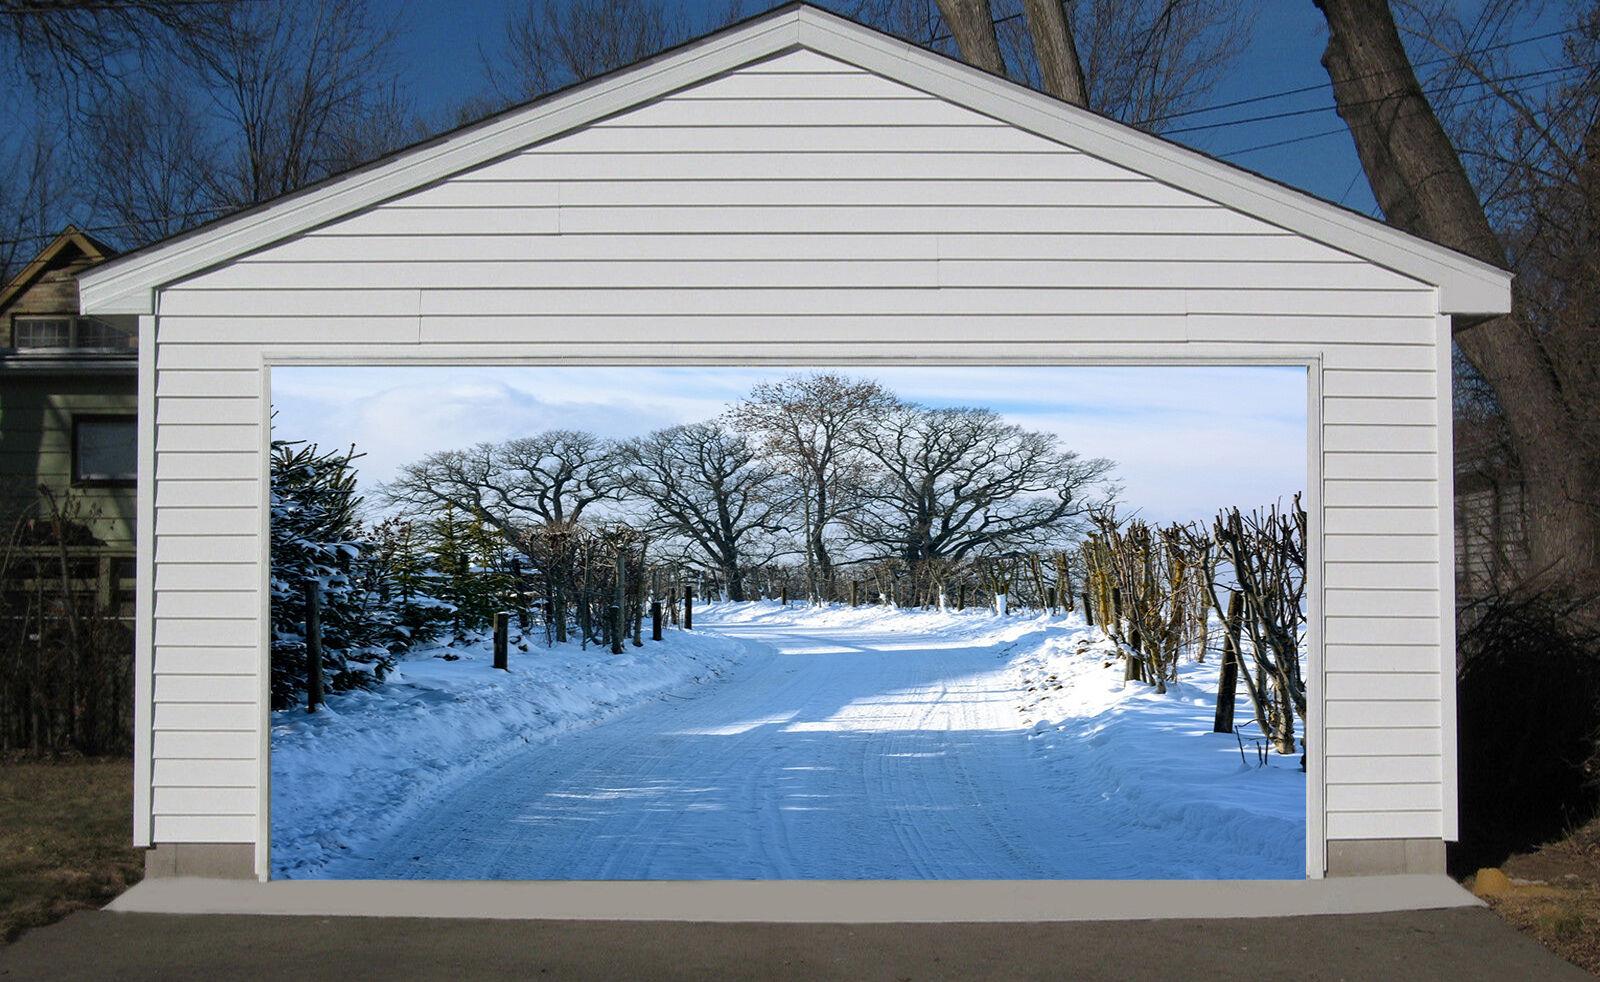 3D Snow Road 057 Garage Door Murals Wall Print Decal Wall Deco AJ WALLPAPER IE